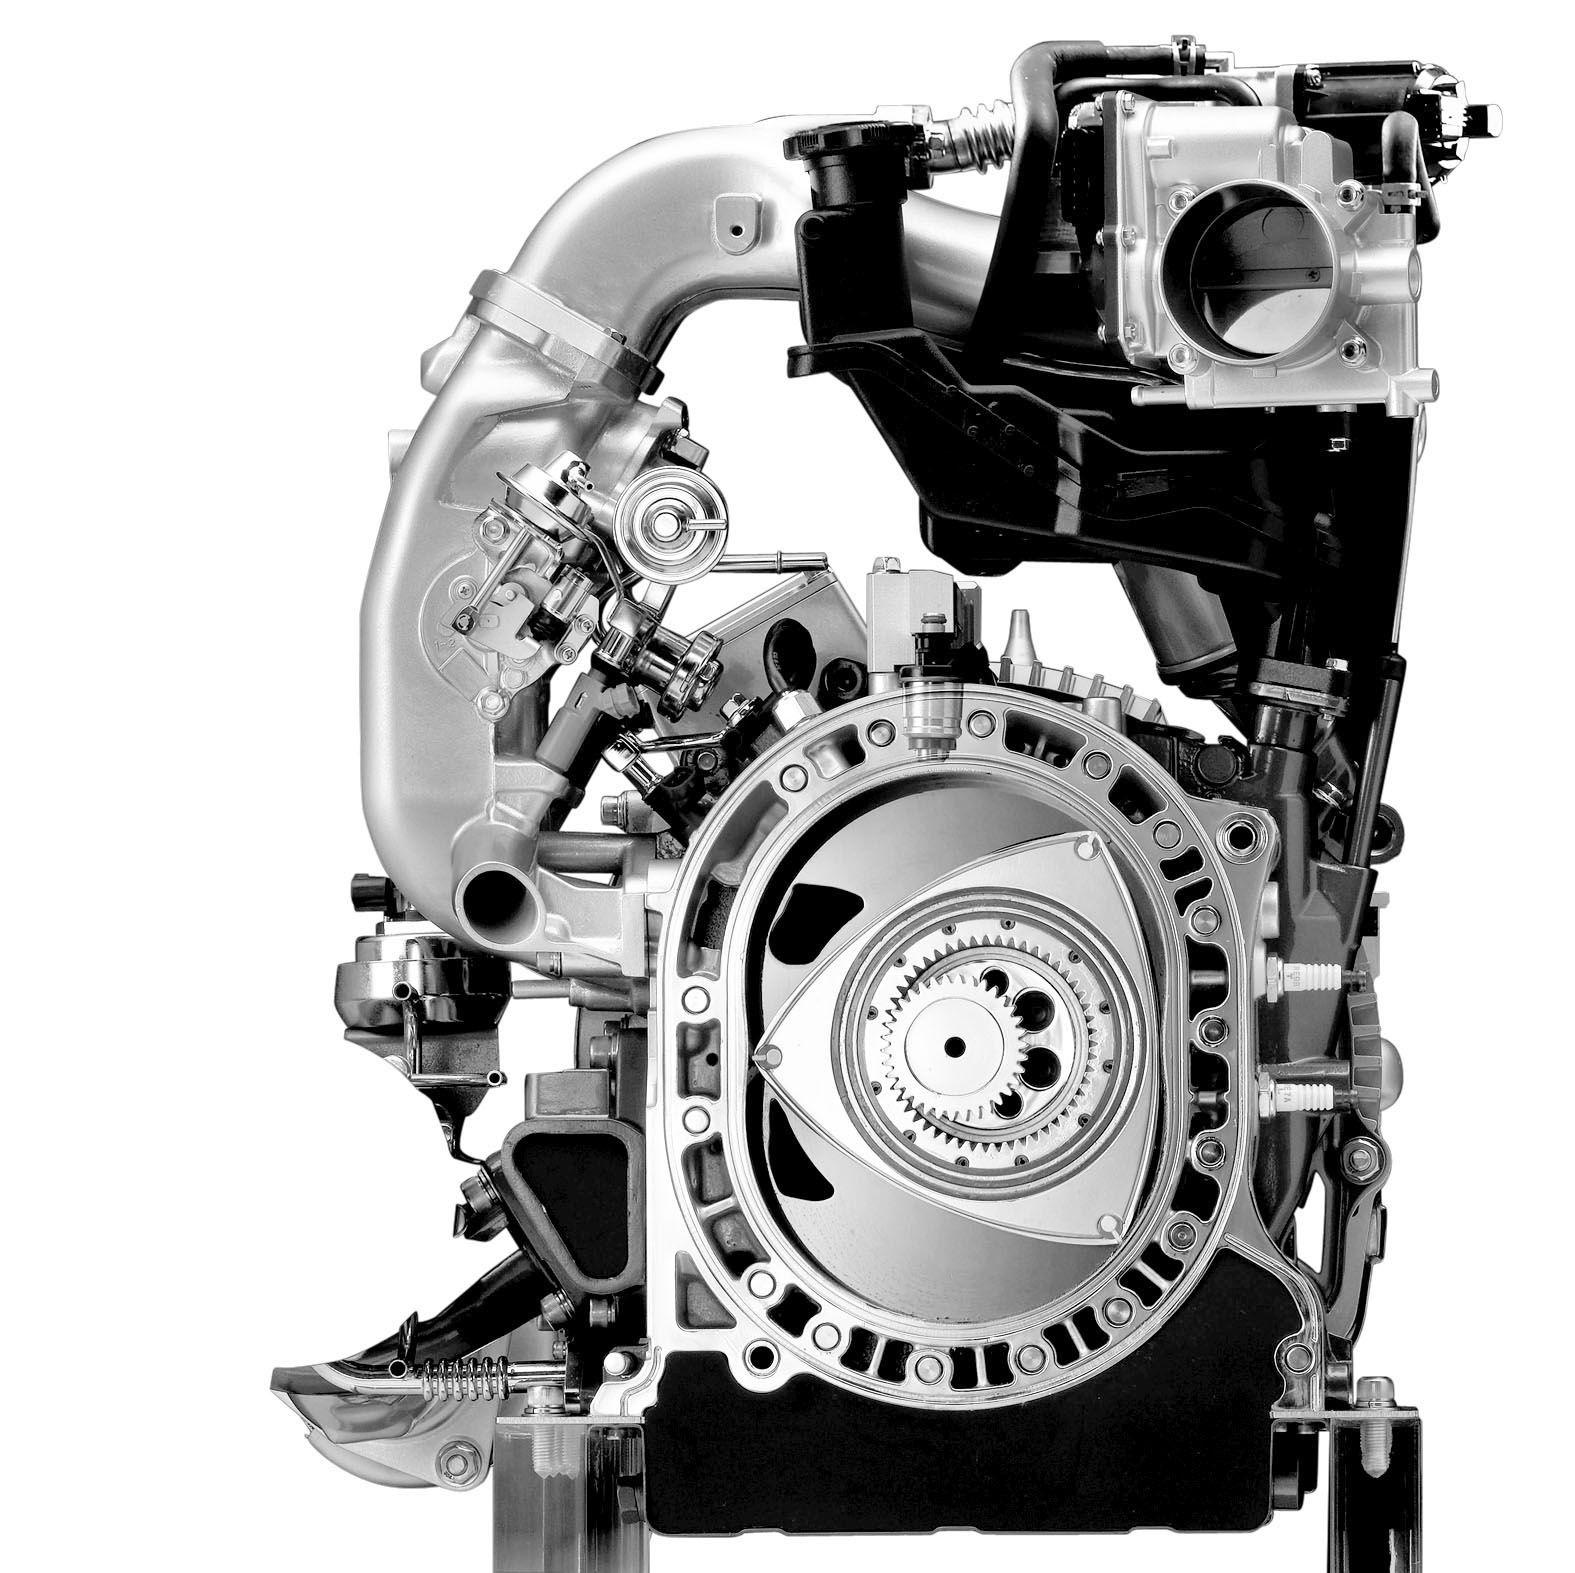 mazda wankel rotary engine how the rotary engine works rh popularmechanics com Mazda RX-8 Rotary Engine Problems Mazda RX-8 Rotary Engine Problems